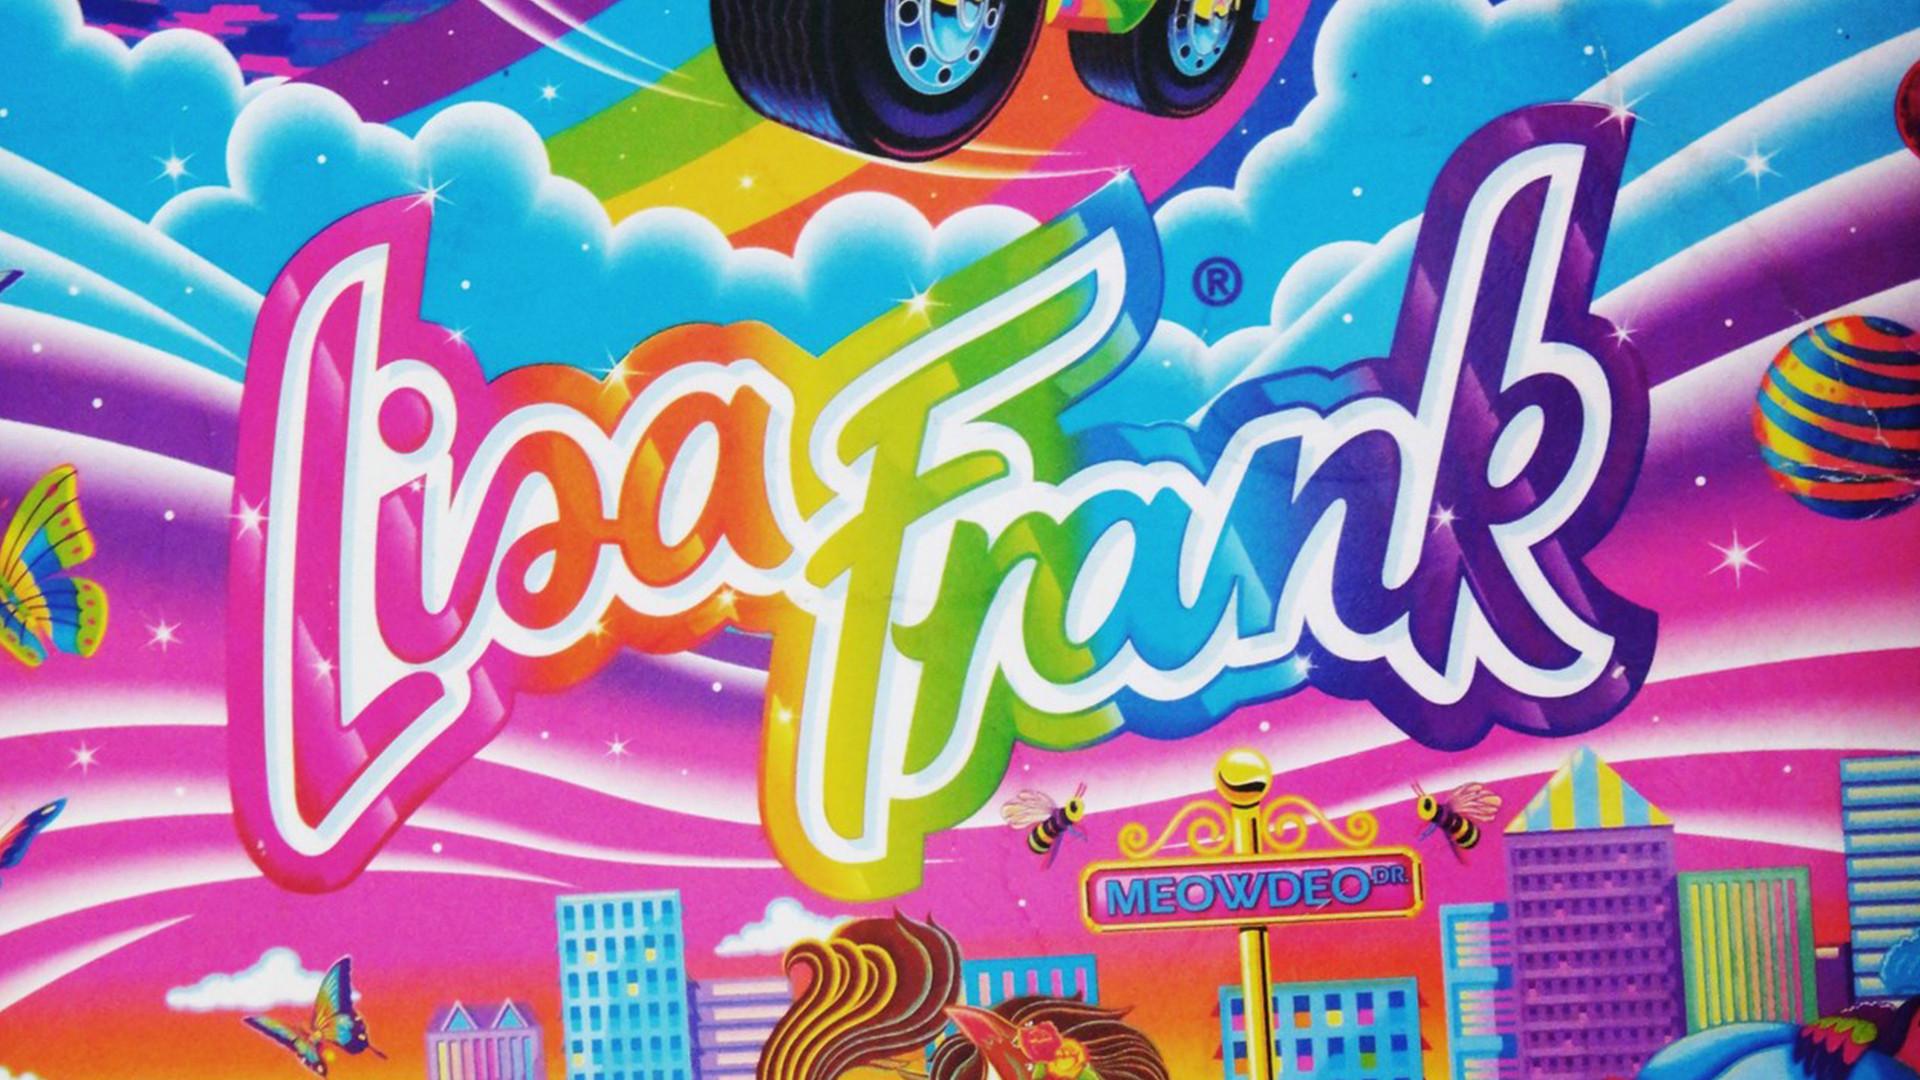 Lisa Frank Wallpaper